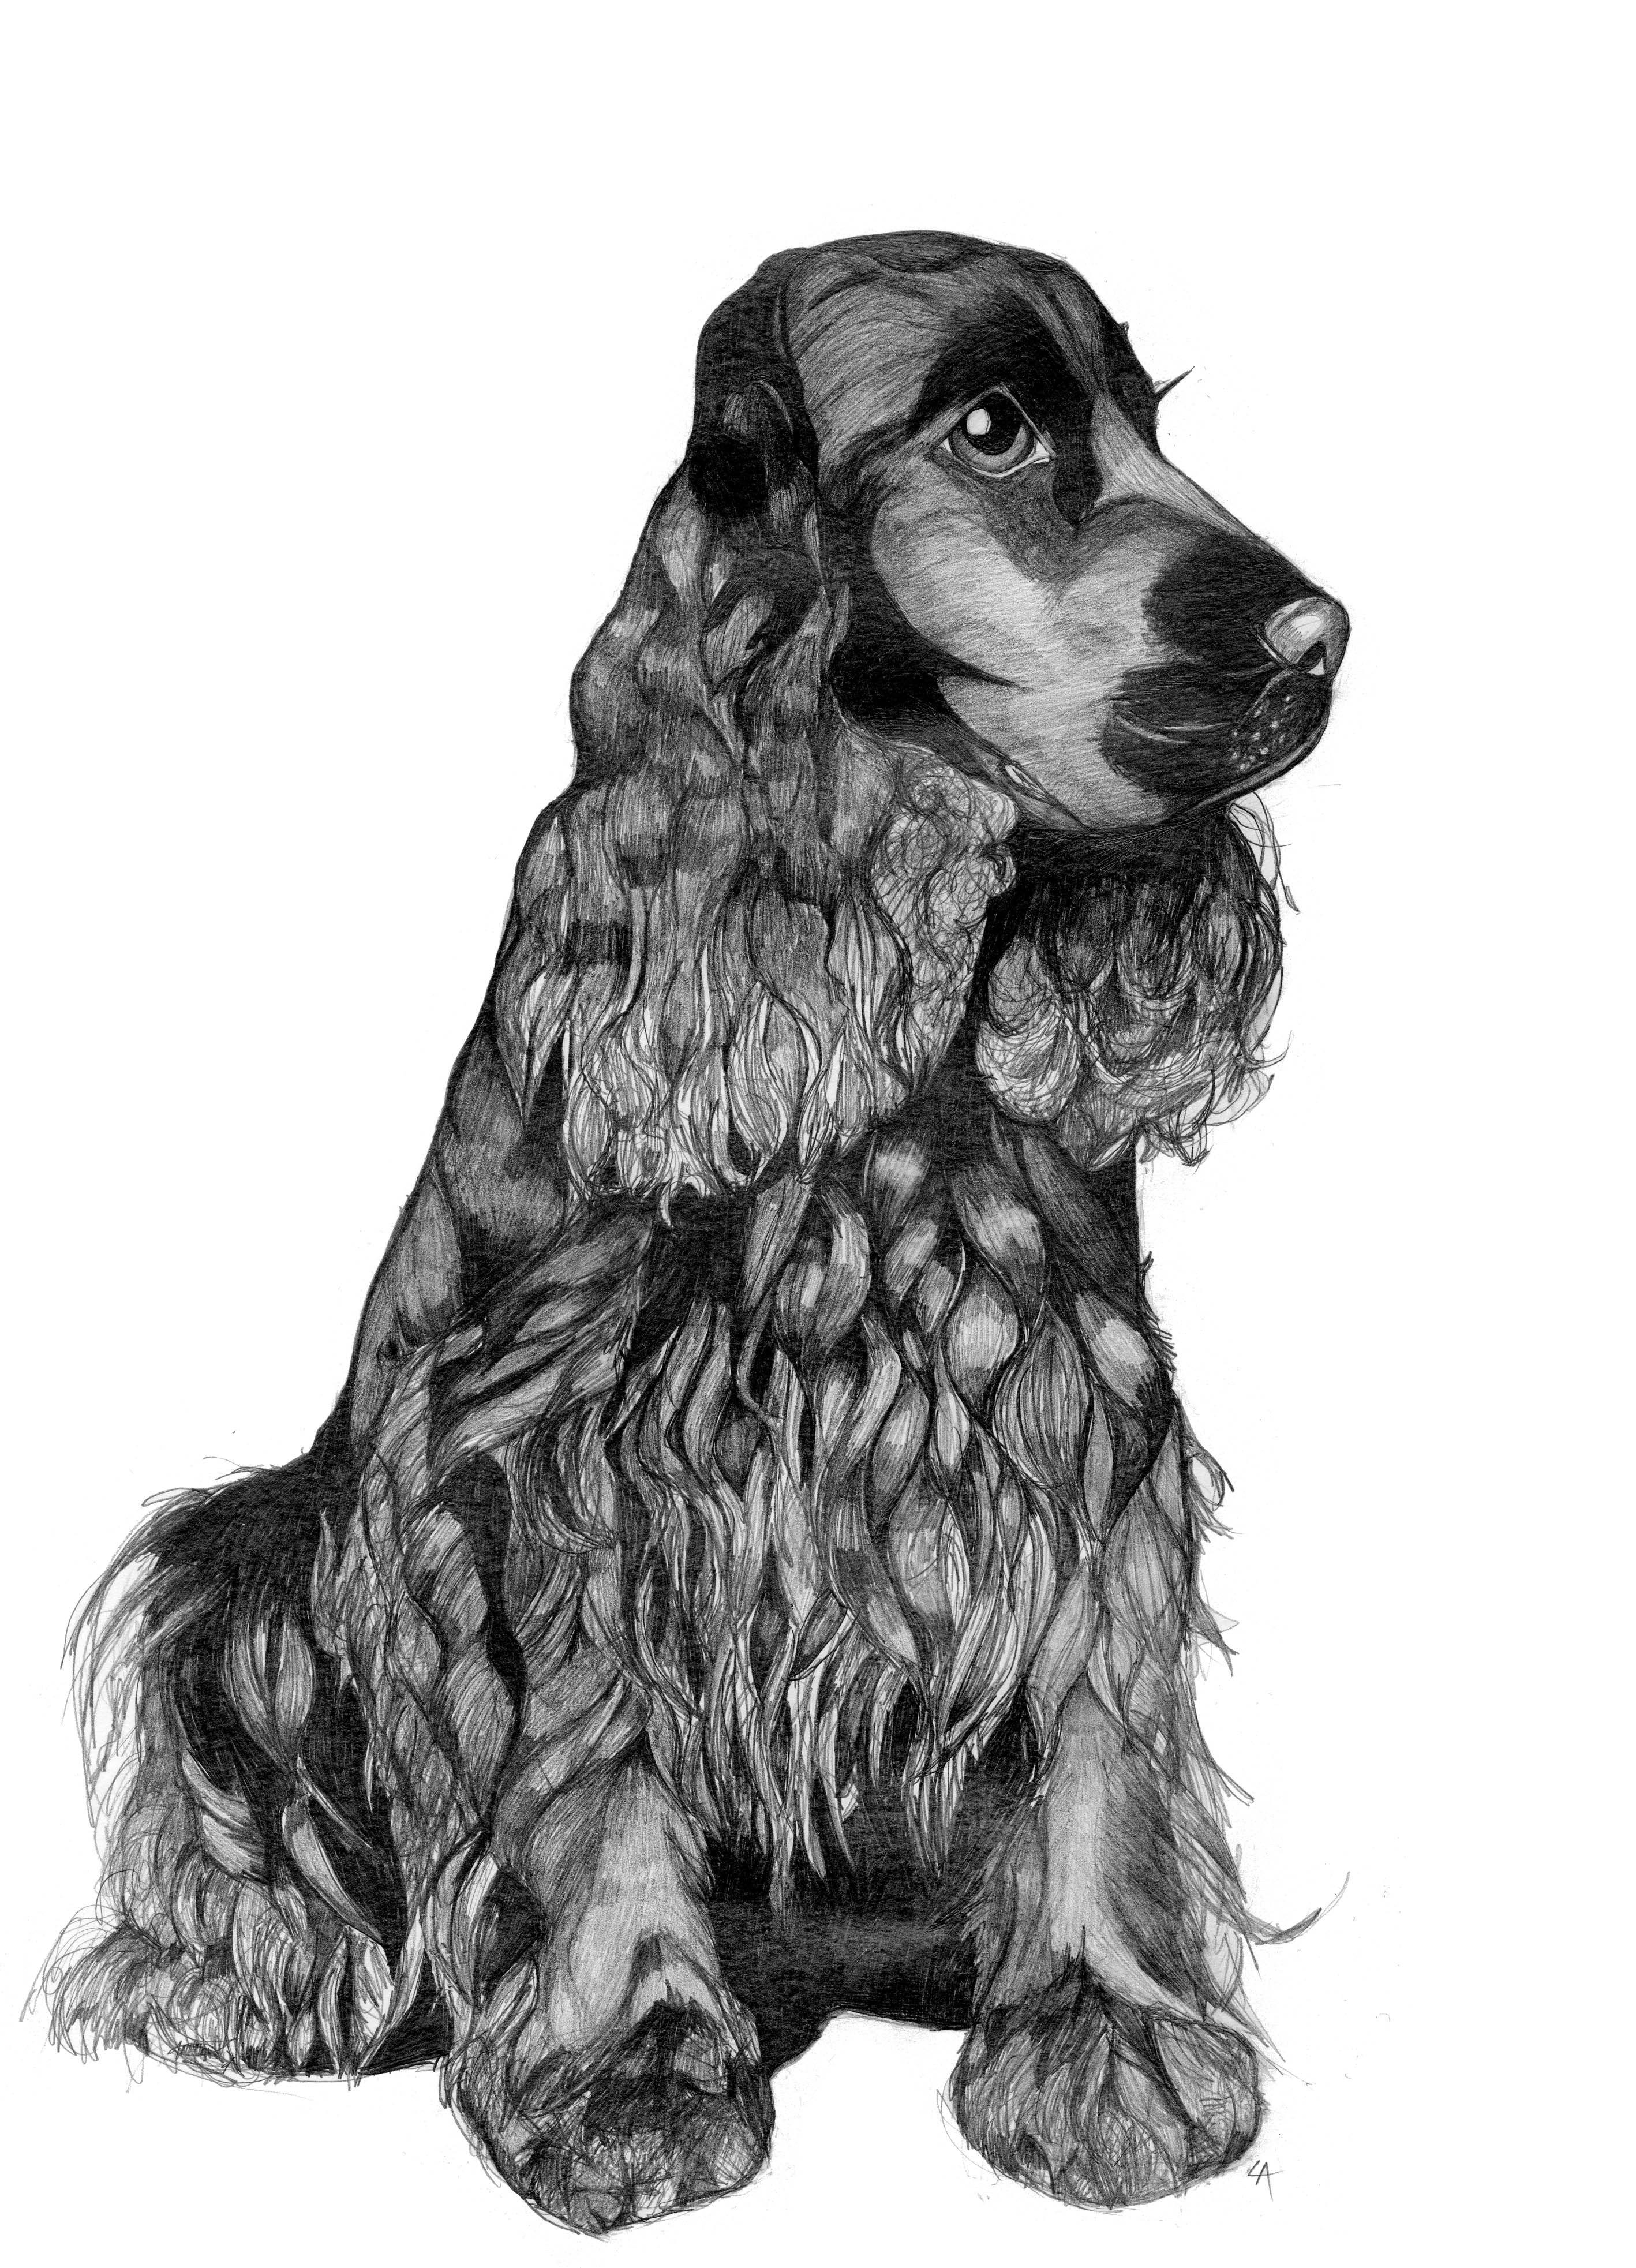 #louiseackerleyart Original pencil illustration by me, Louise Ackerley, of an English Cocker Spaniel